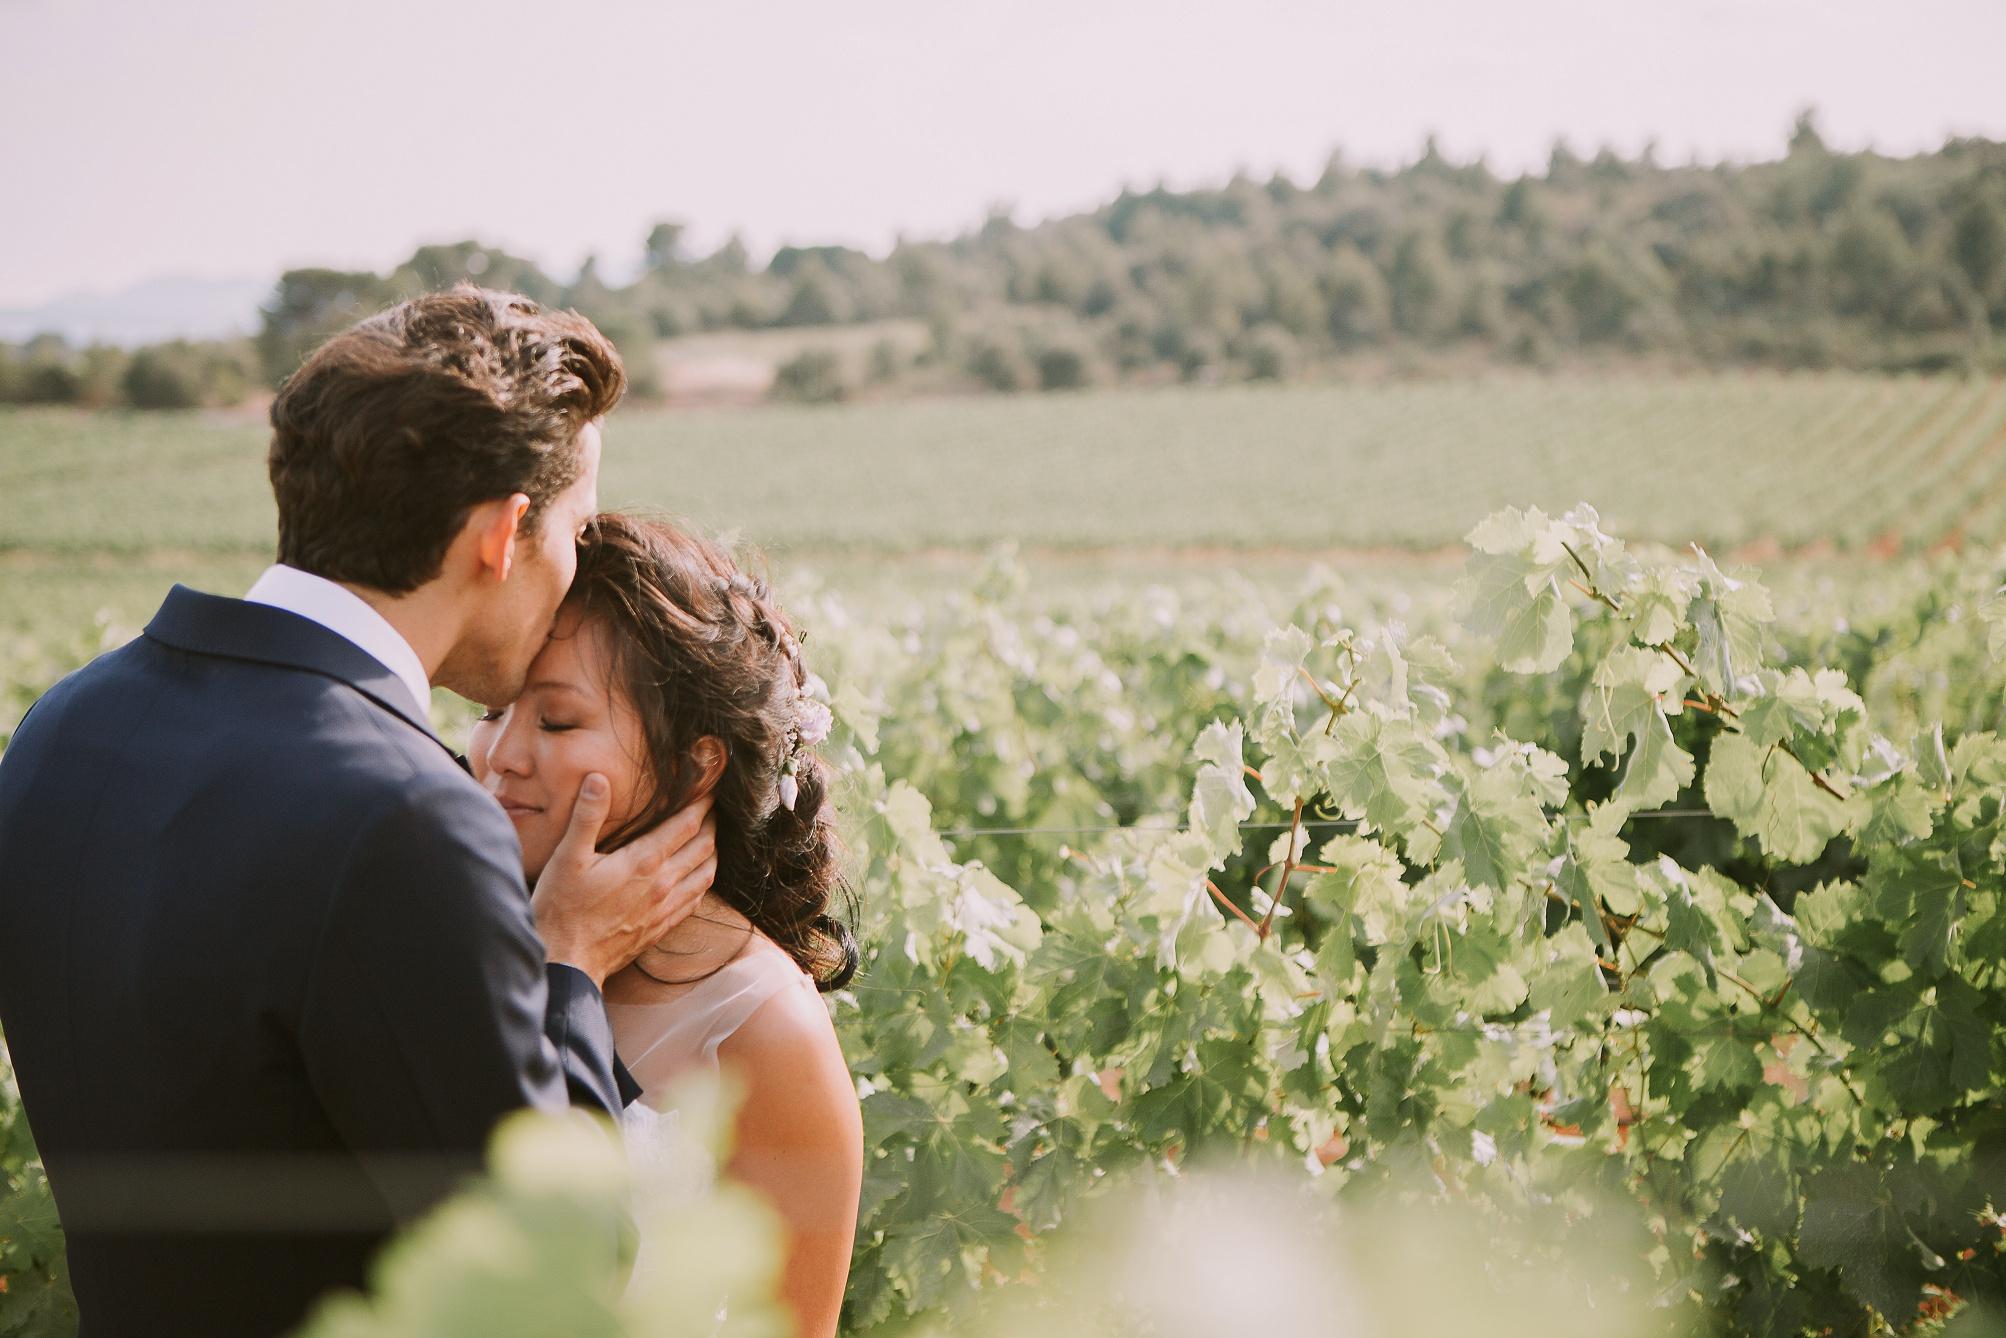 katerynaphotos-mariage-photographe-puyloubier-provence-aix-en-provence-sud-de-la-france_0405.jpg